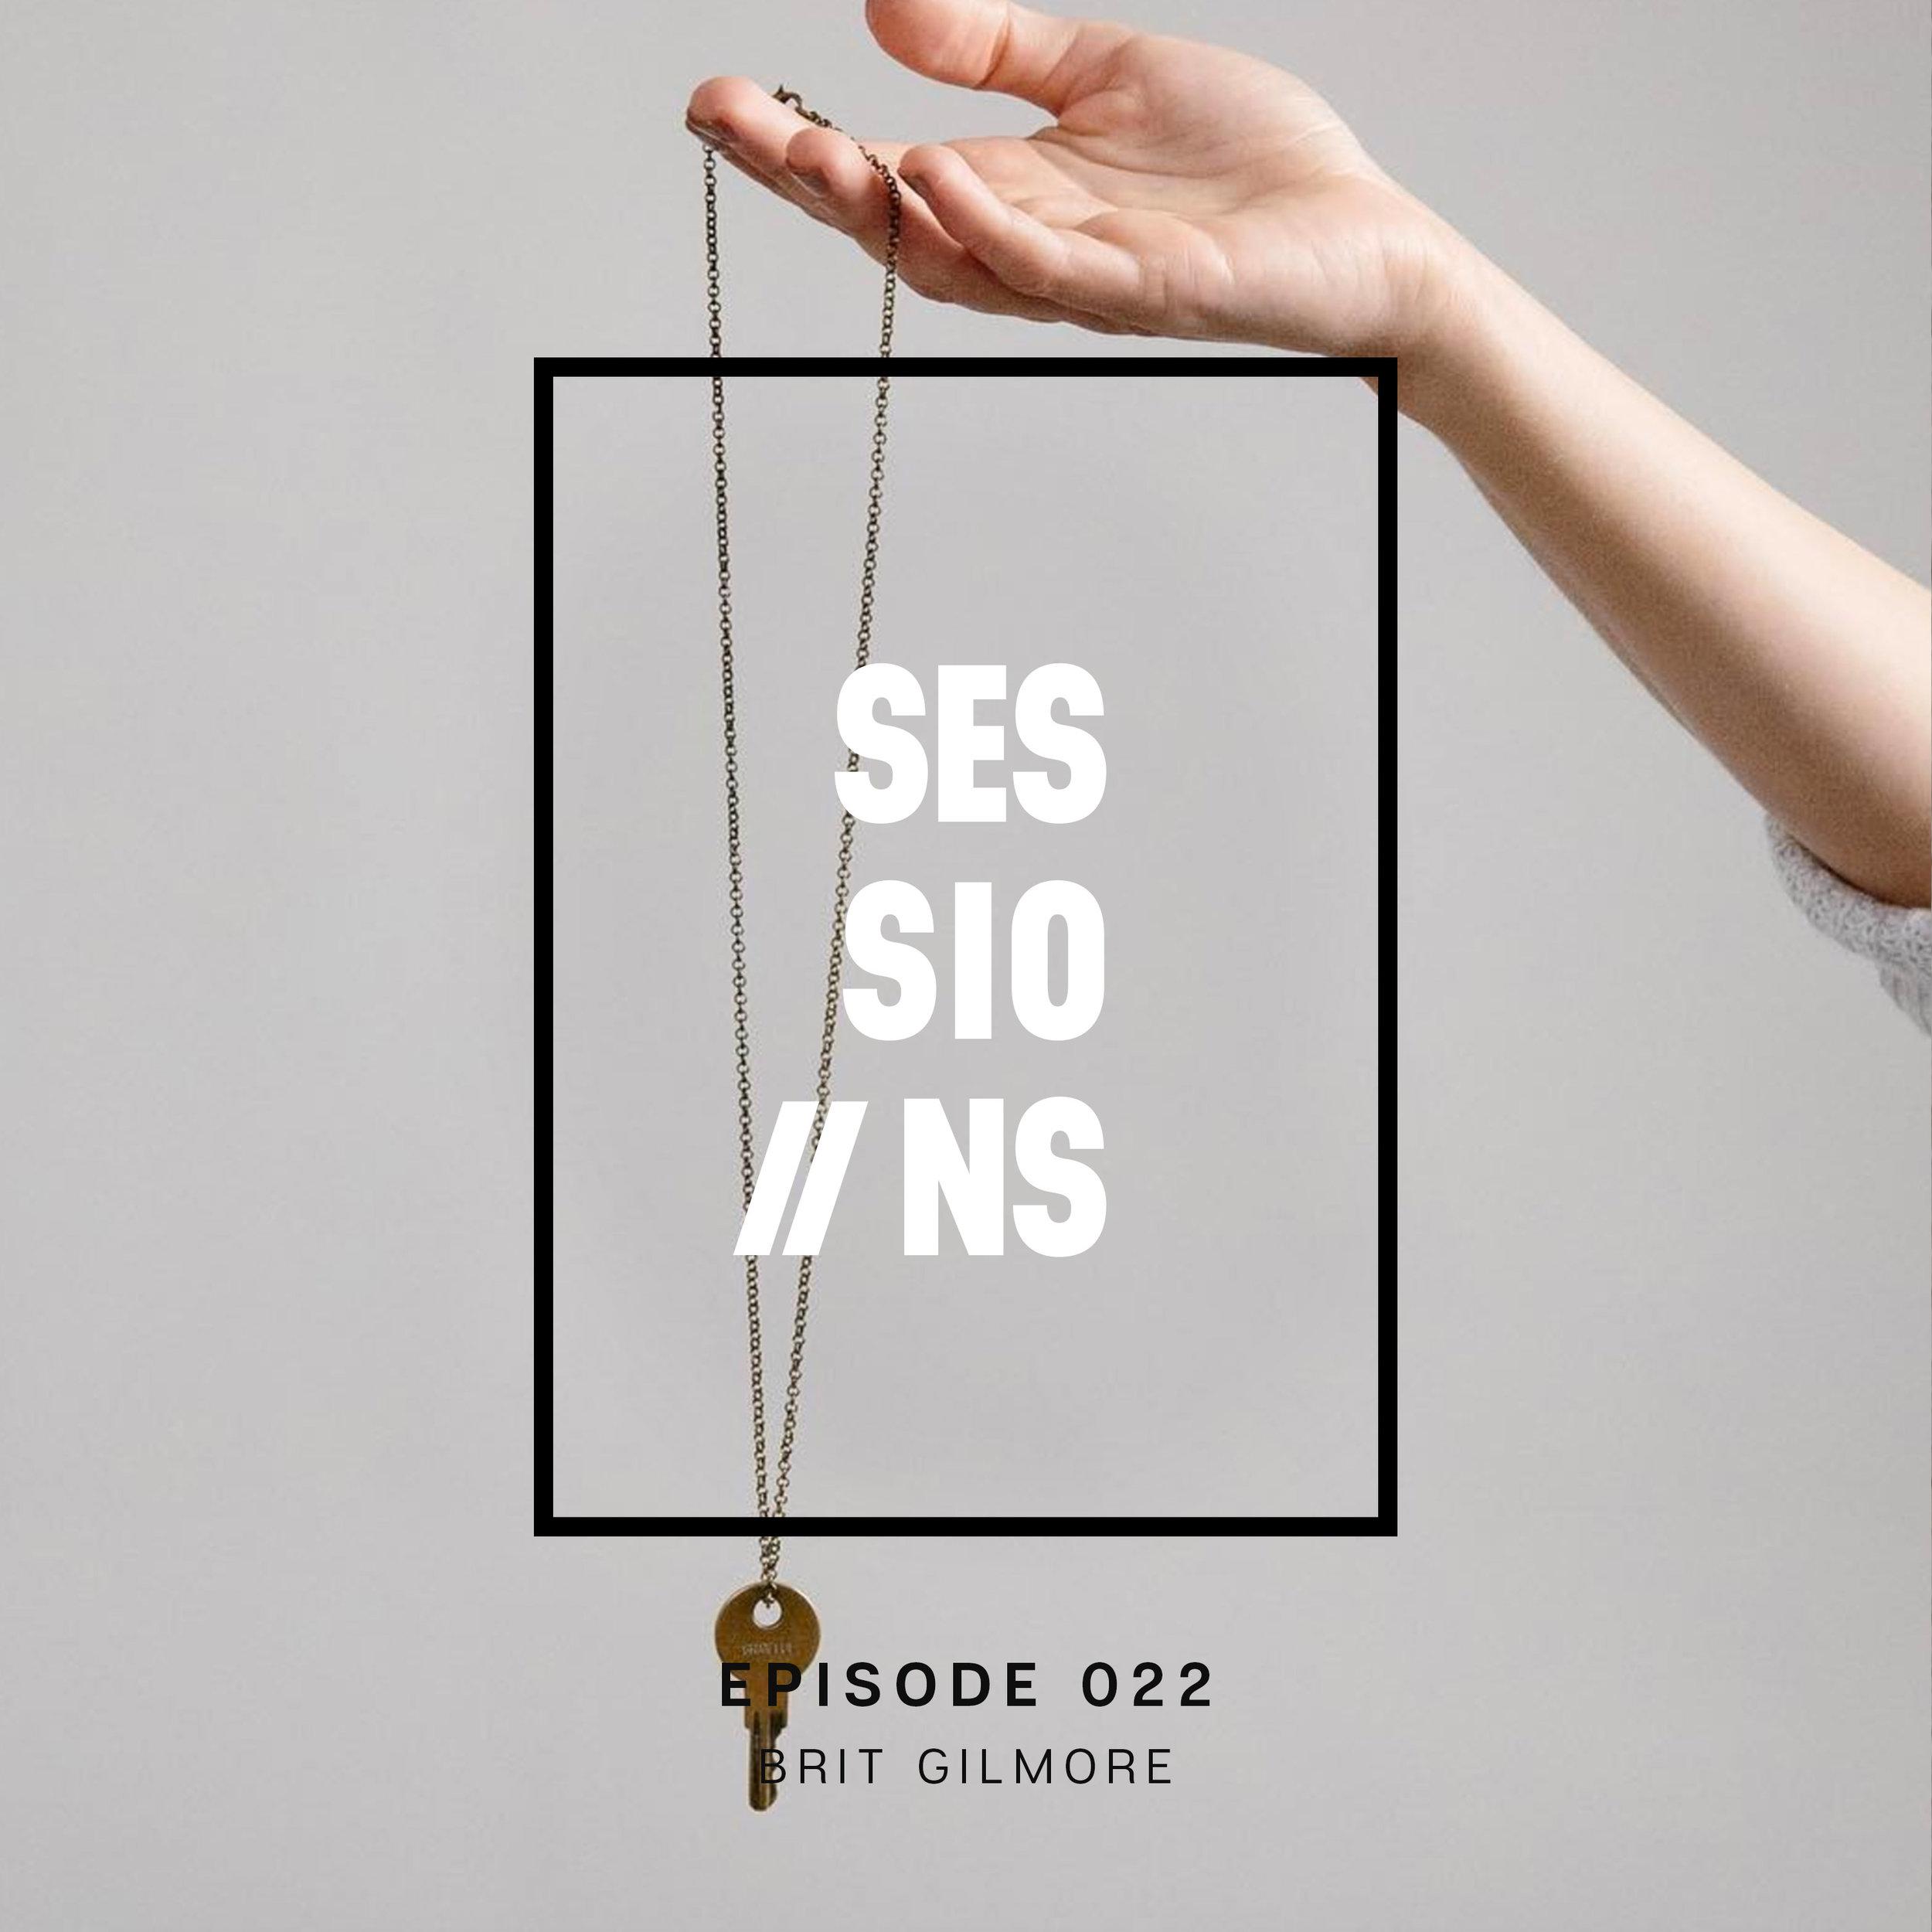 Sessions-Logo_Episode-002.jpg